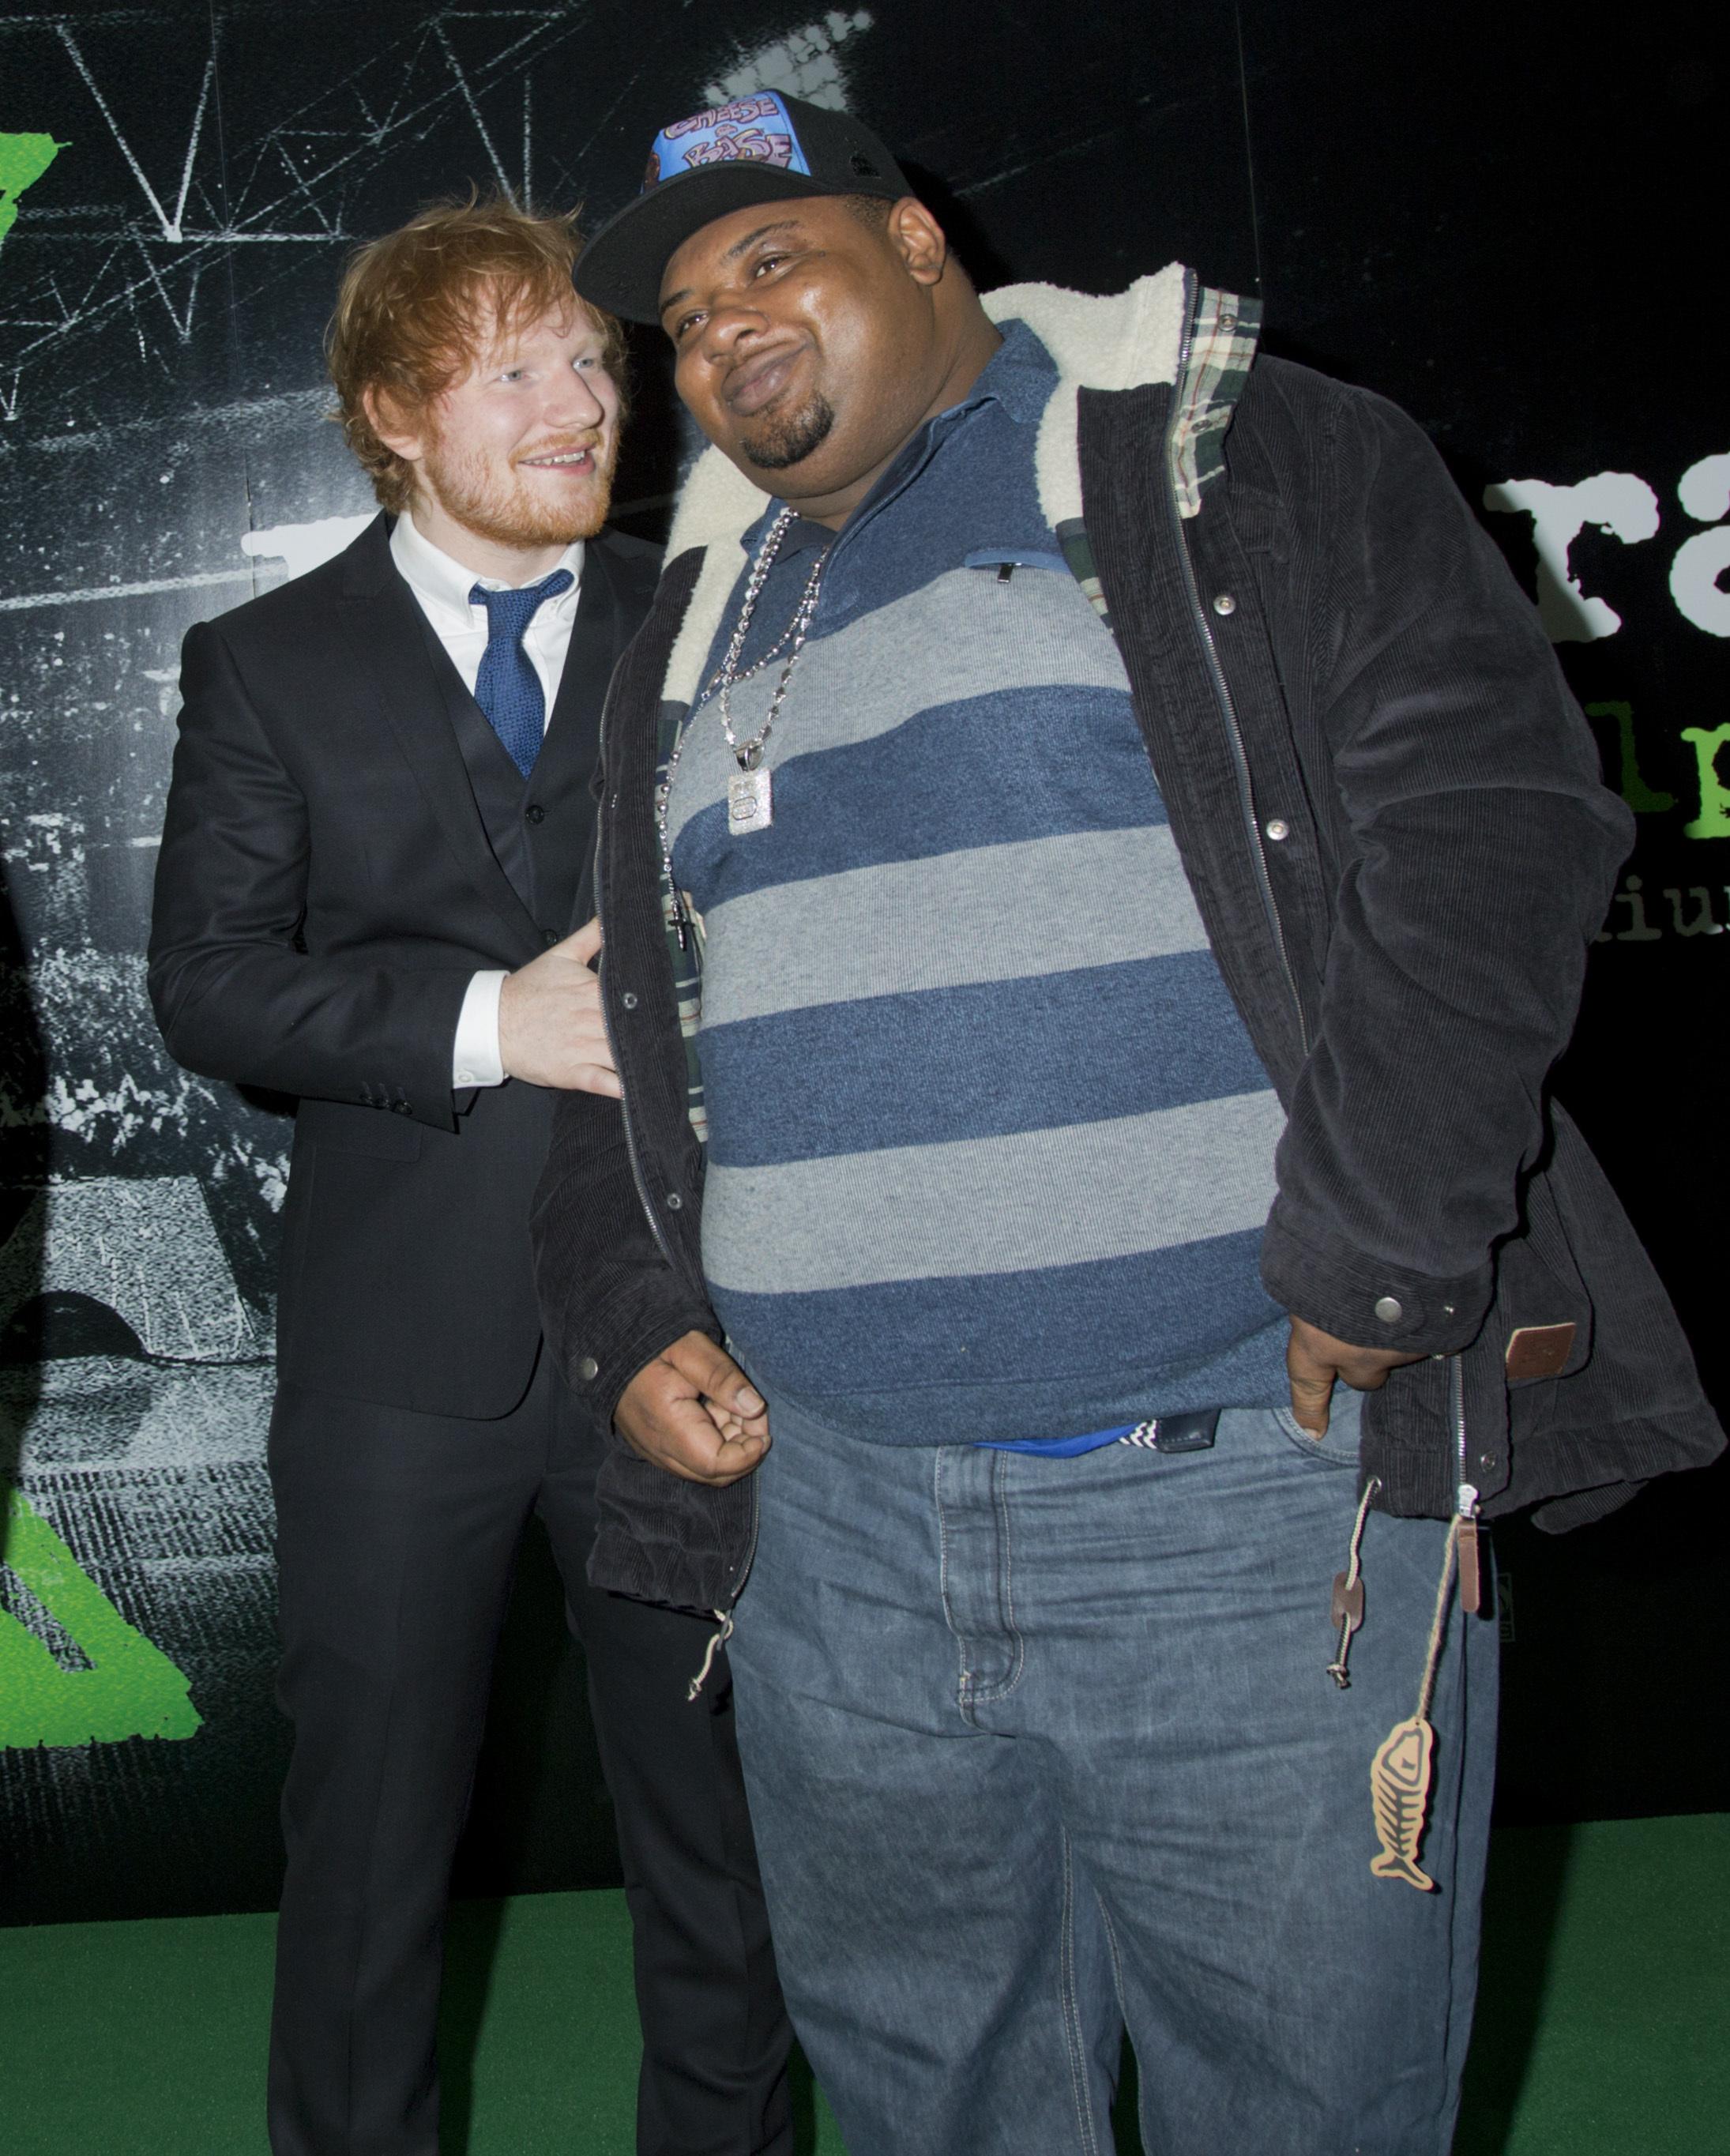 Ed Sheeran and Big Narstie